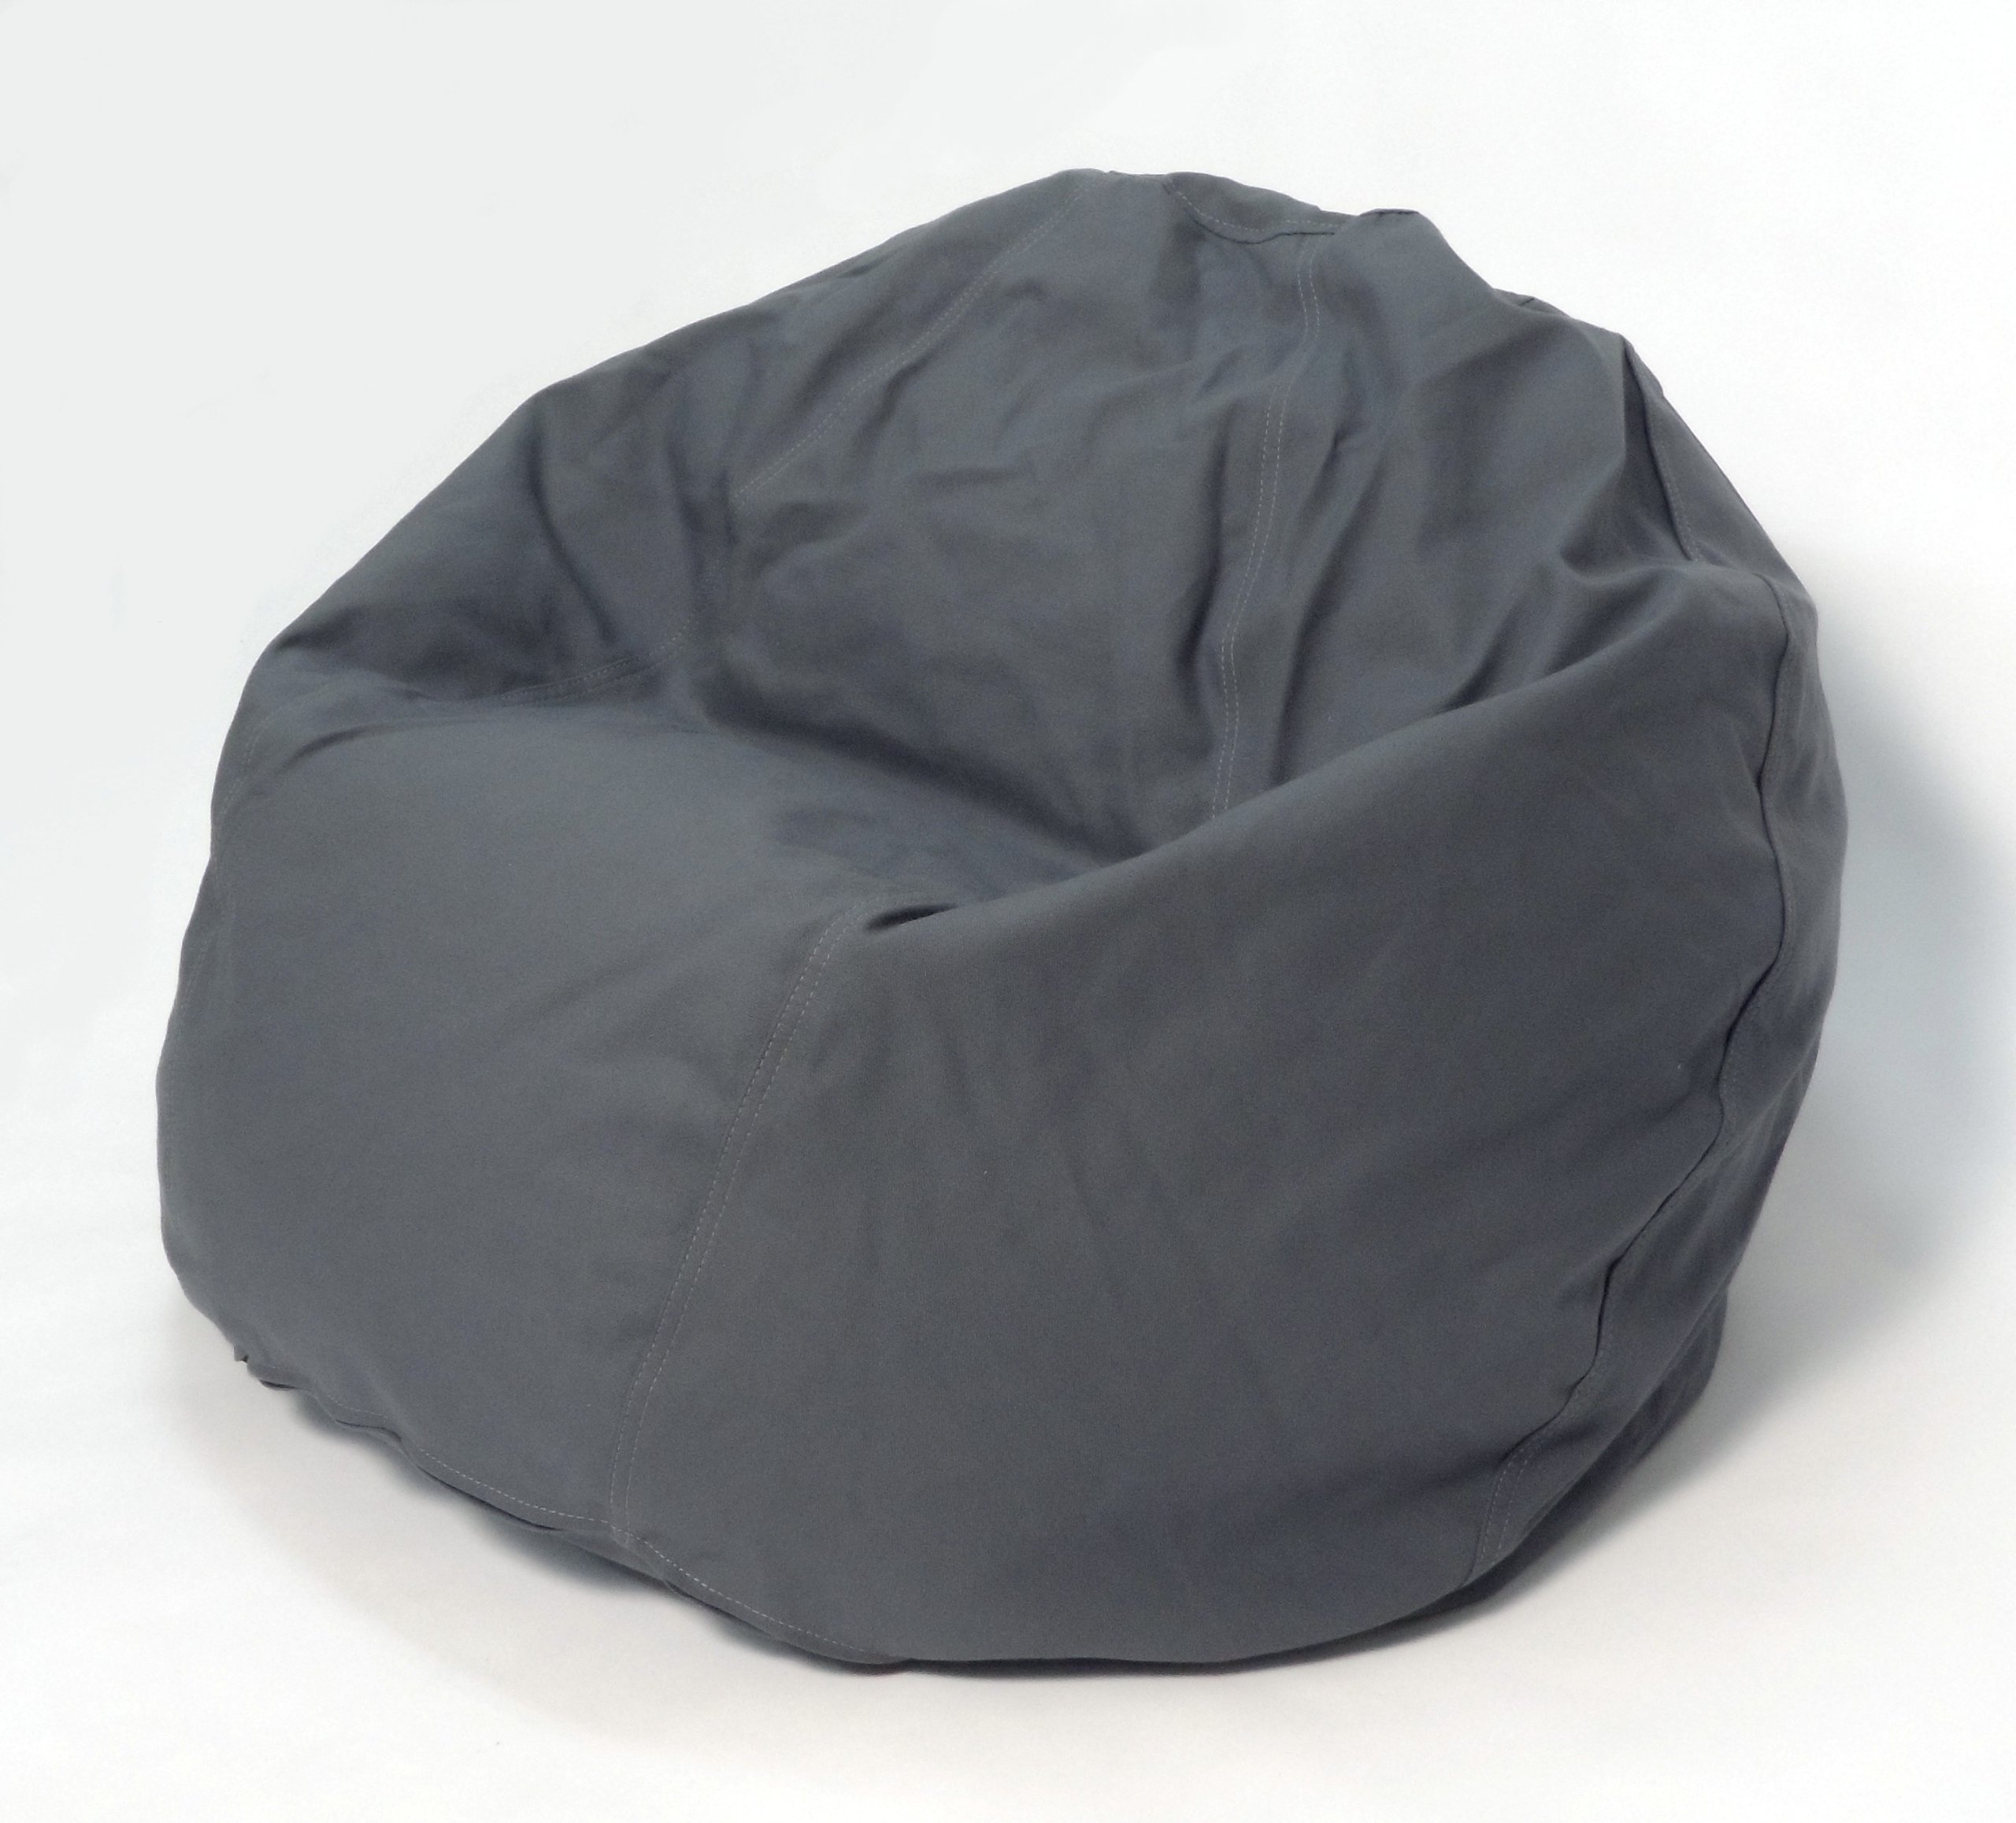 bean bag made in the usa amazon com rh amazon com